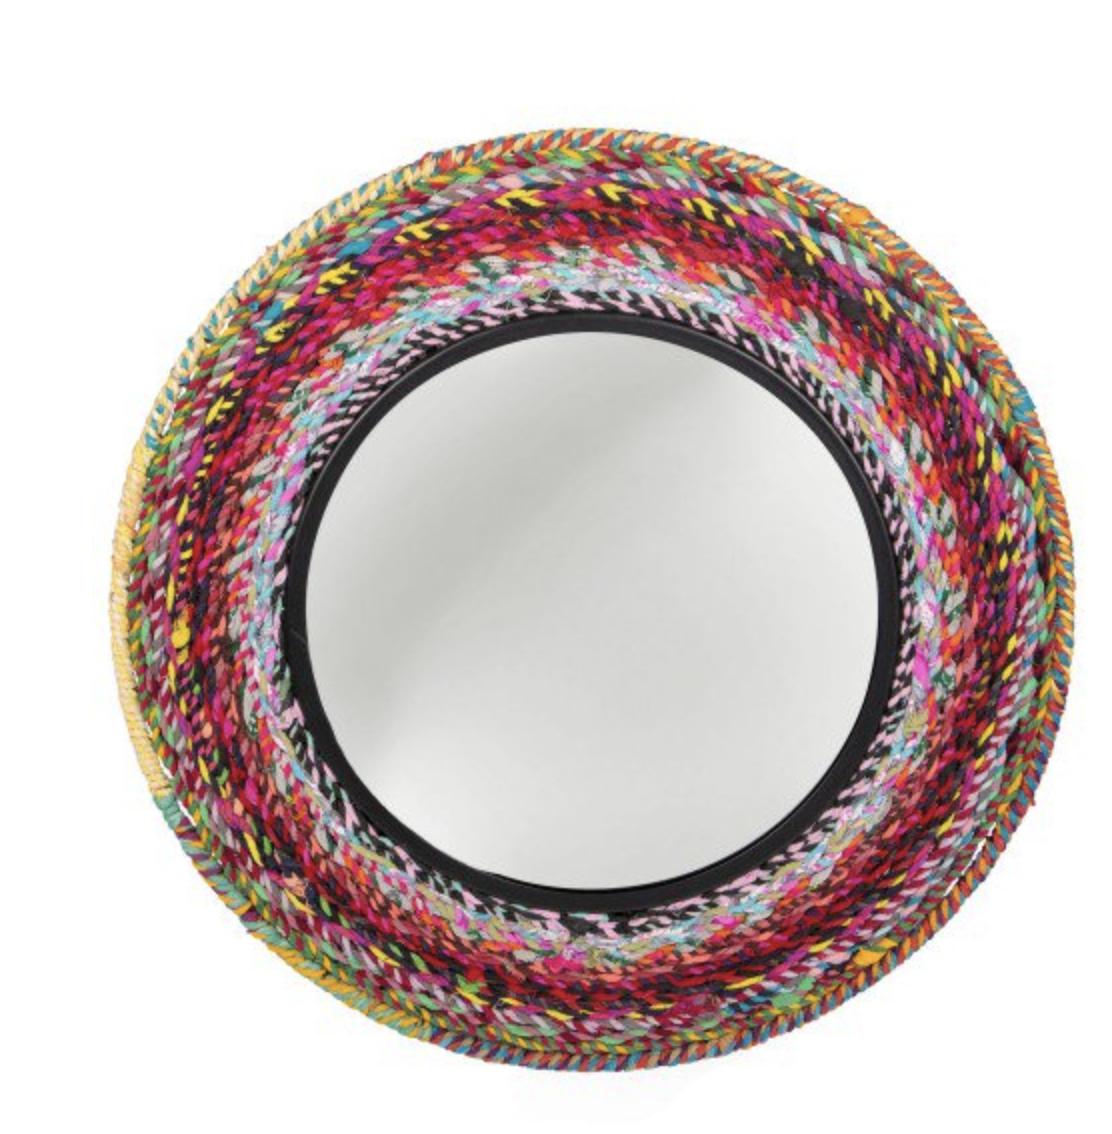 Upcycled Rainbow Mirror